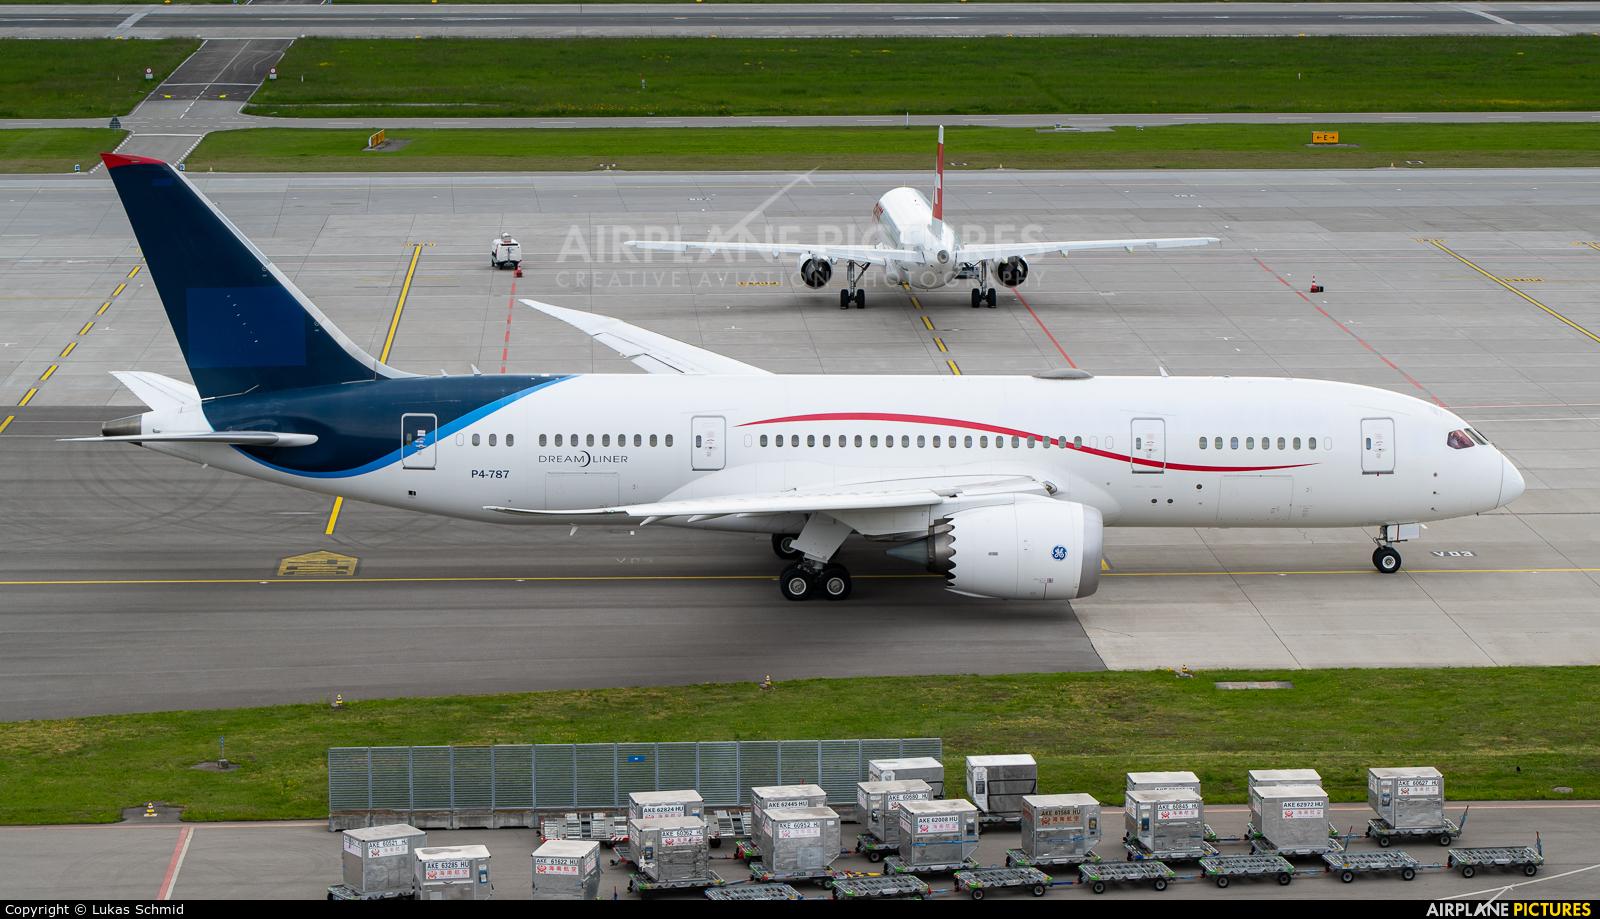 Comlux Aviation P4-787 aircraft at Zurich